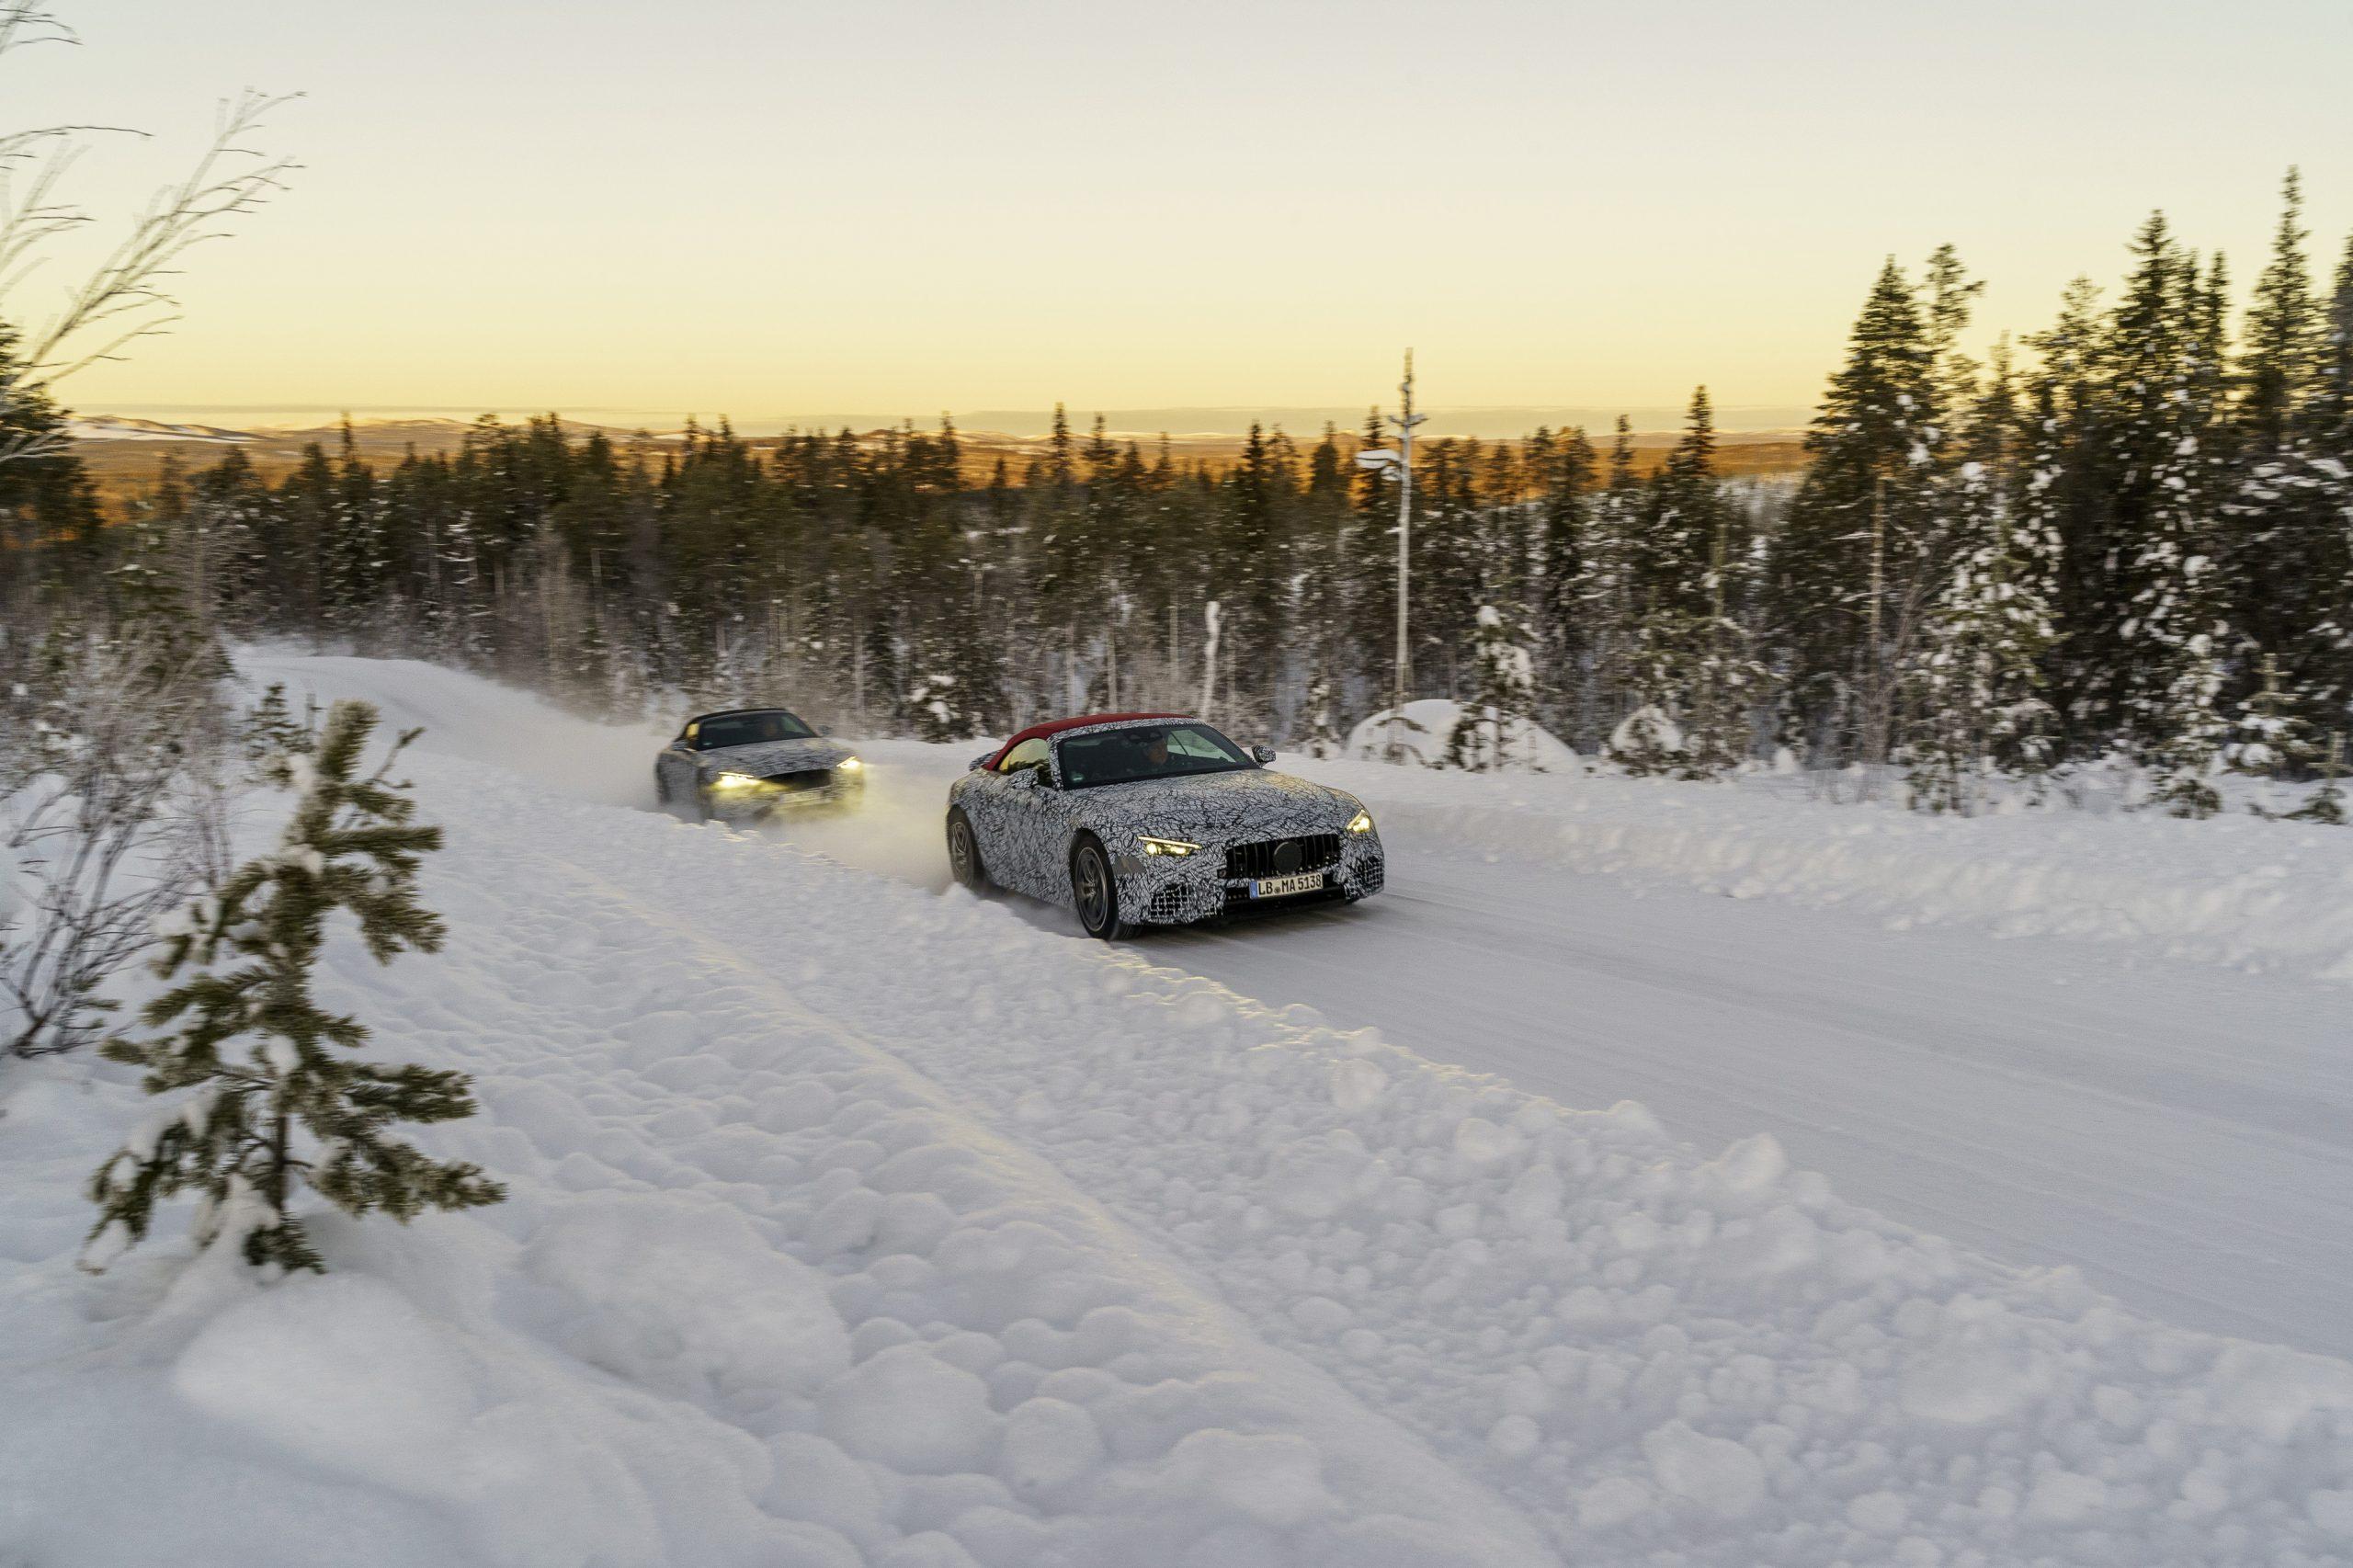 Mercedes SL winter testing both cars lead follow